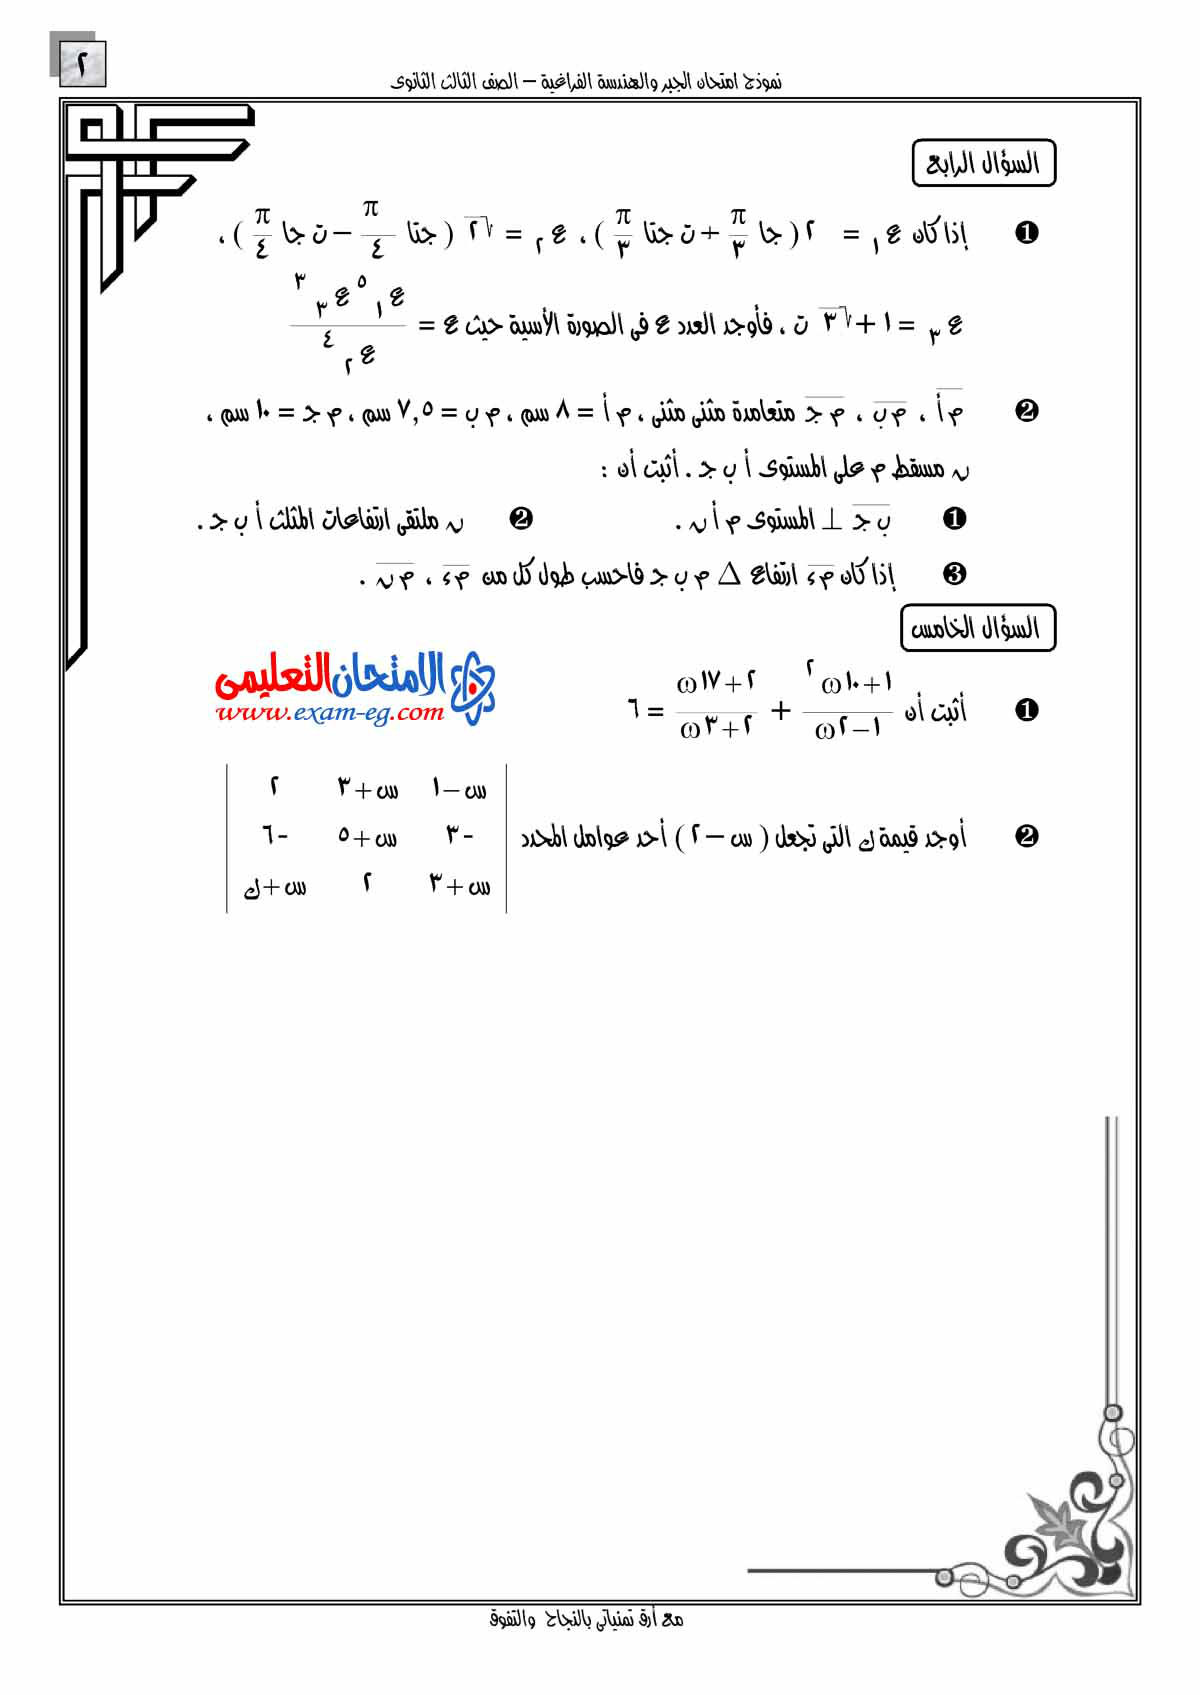 exam-eg.com_1403332539472.jpg